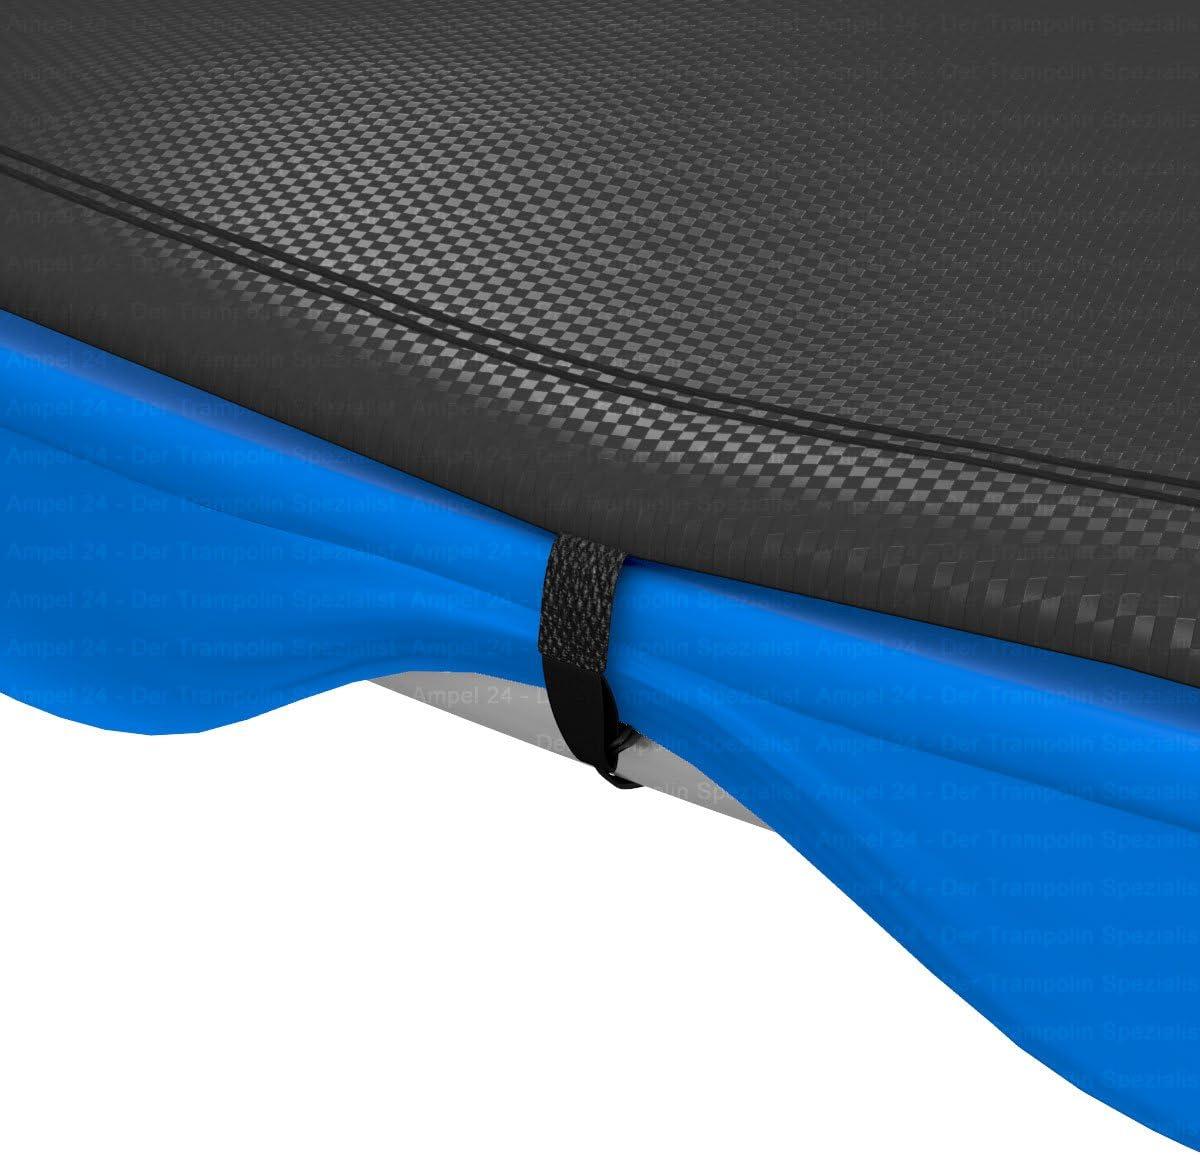 Black Ampel 24 Trampoline rain cover UV-resistant cover Weather-resistant cover for 8ft garden trampolines